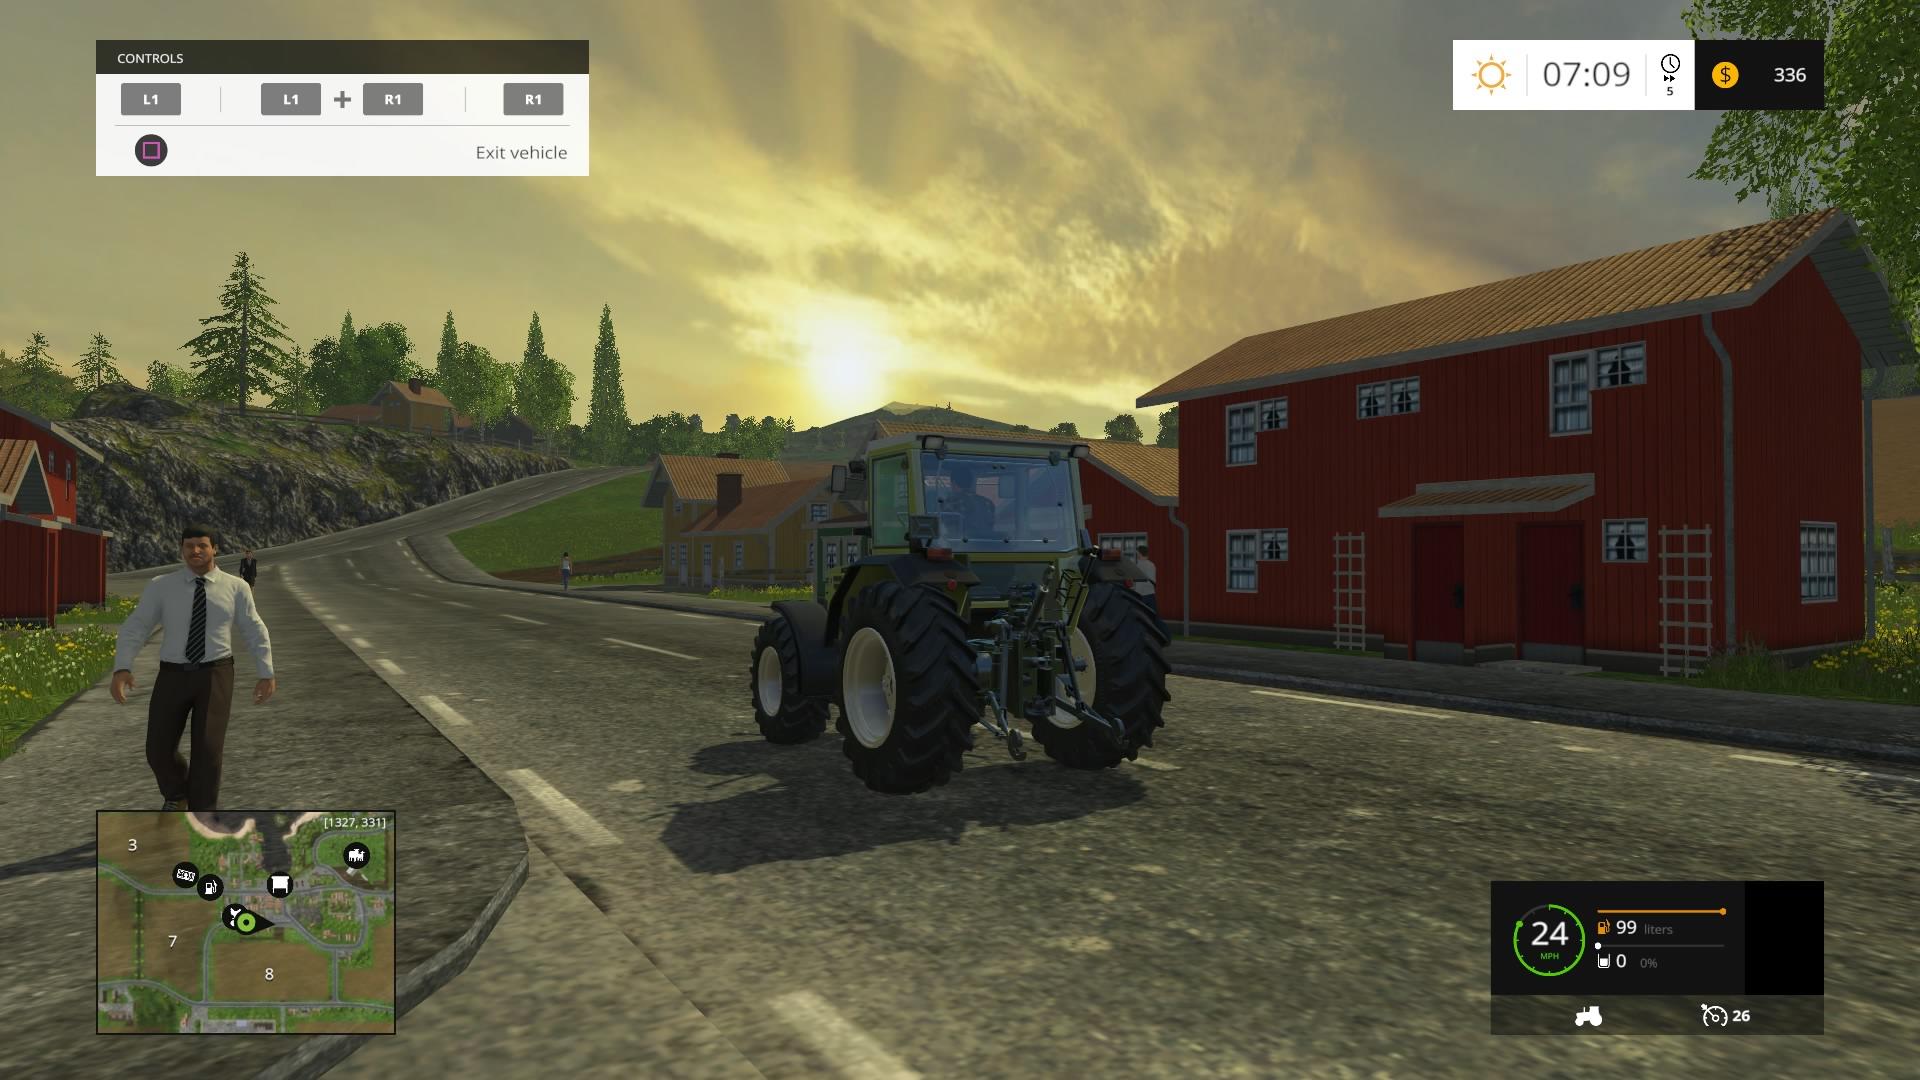 Farming-Simulator-15_20150524200155_1.jpg?fit=1920%2C1080&ssl=1